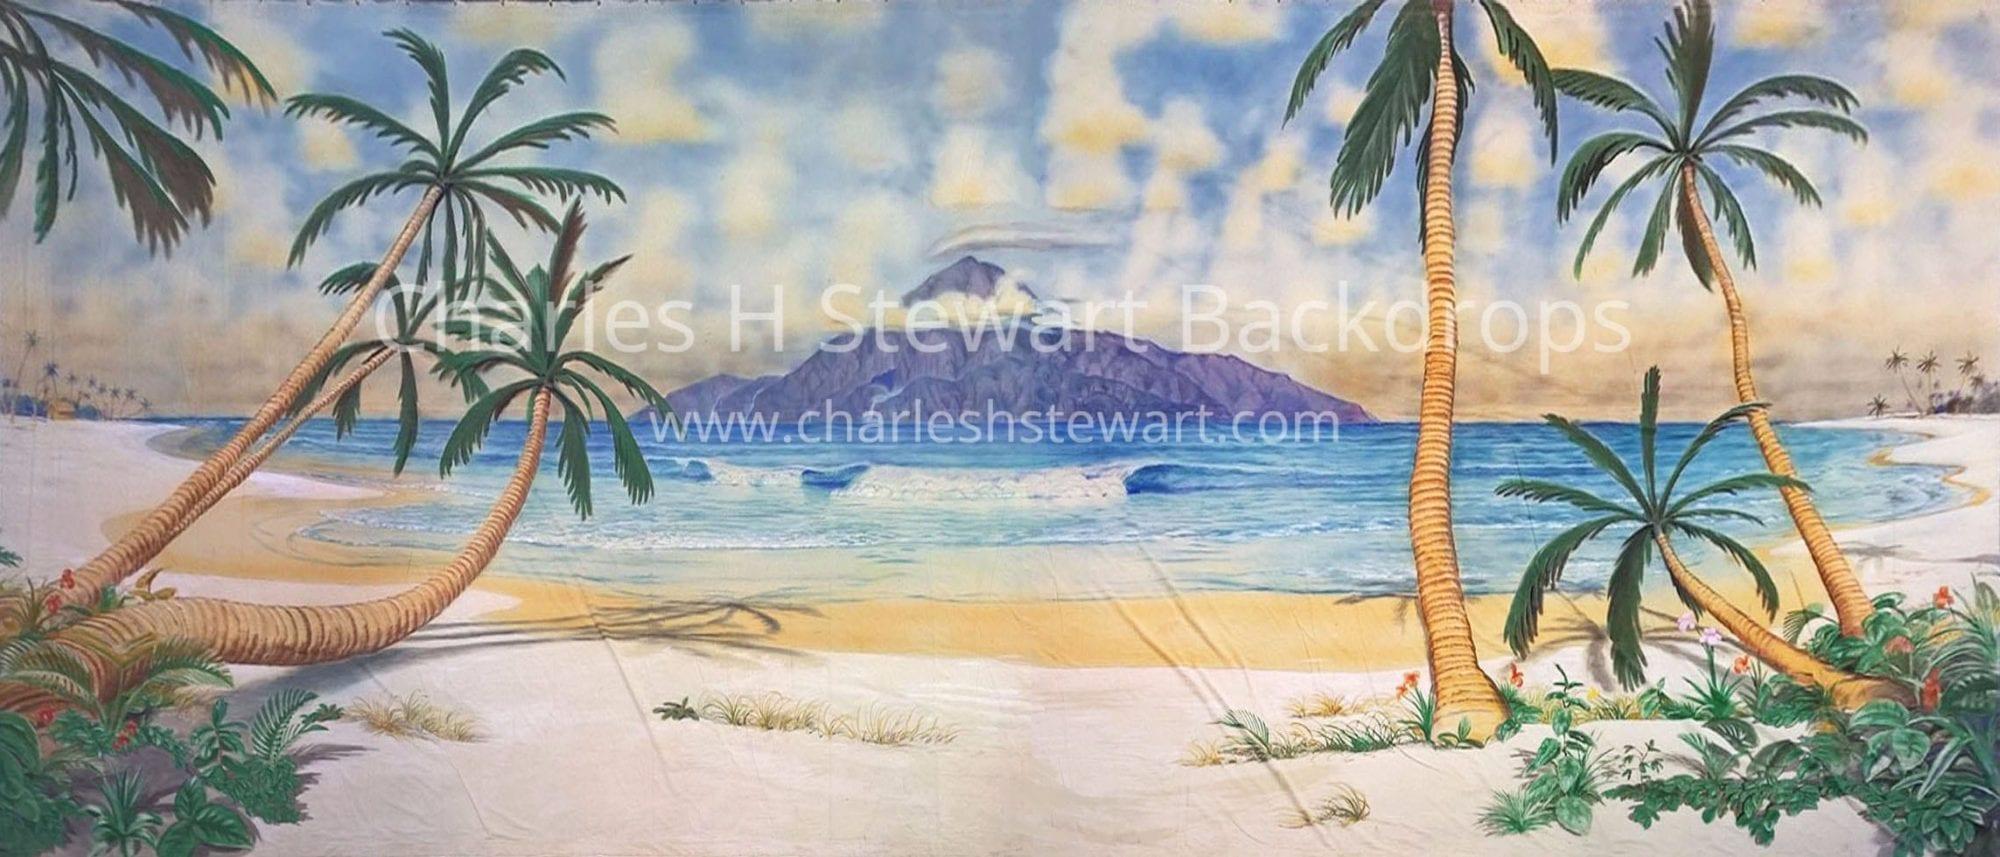 Where Is Bali Hai Island bali hai backdrop | backdrops by charles h. stewart